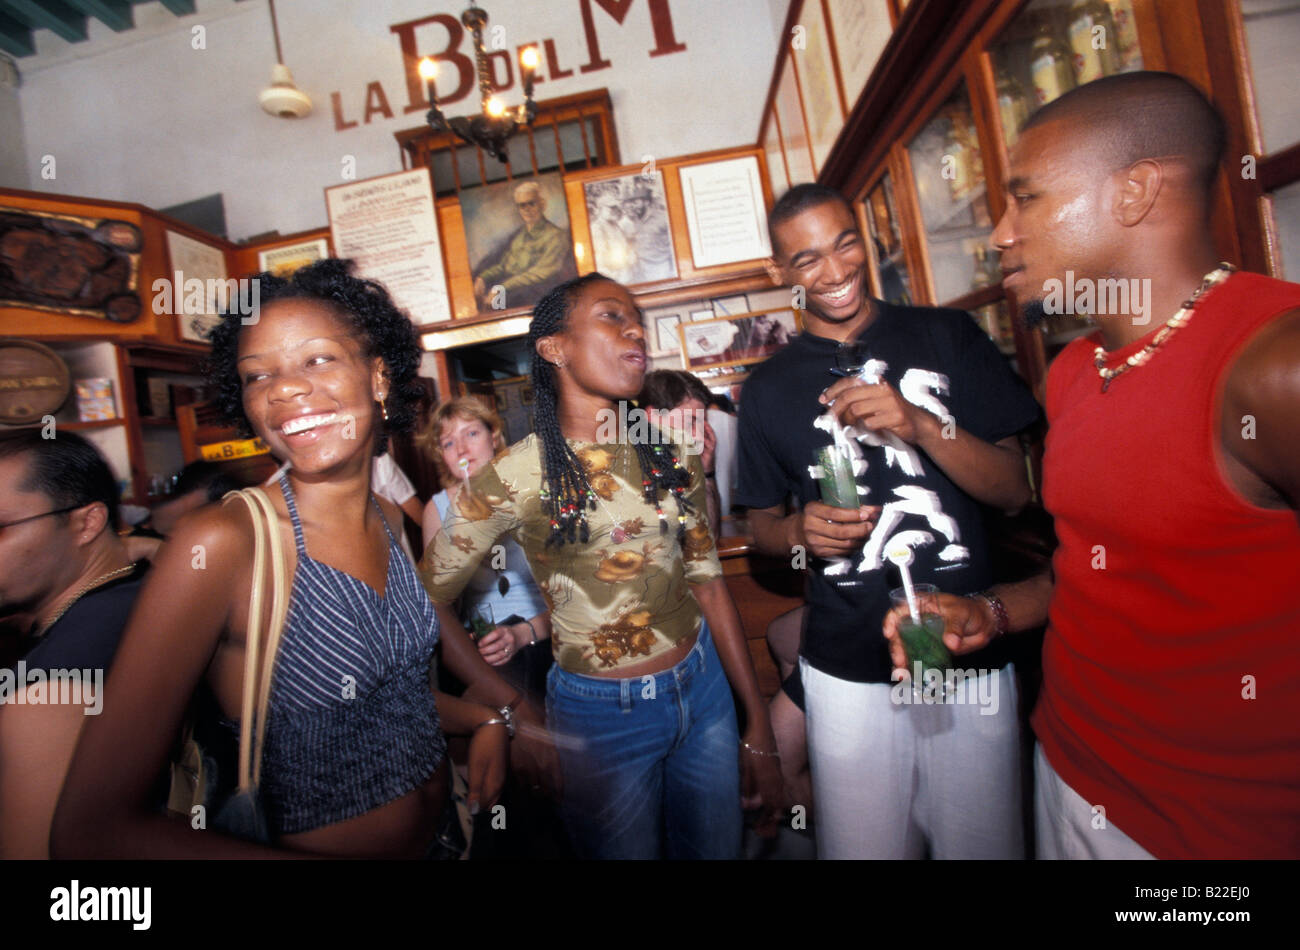 Hemingway Caribbean: La Bodeguita Del Medio Hemingway S Bar In Old Havana Cuba